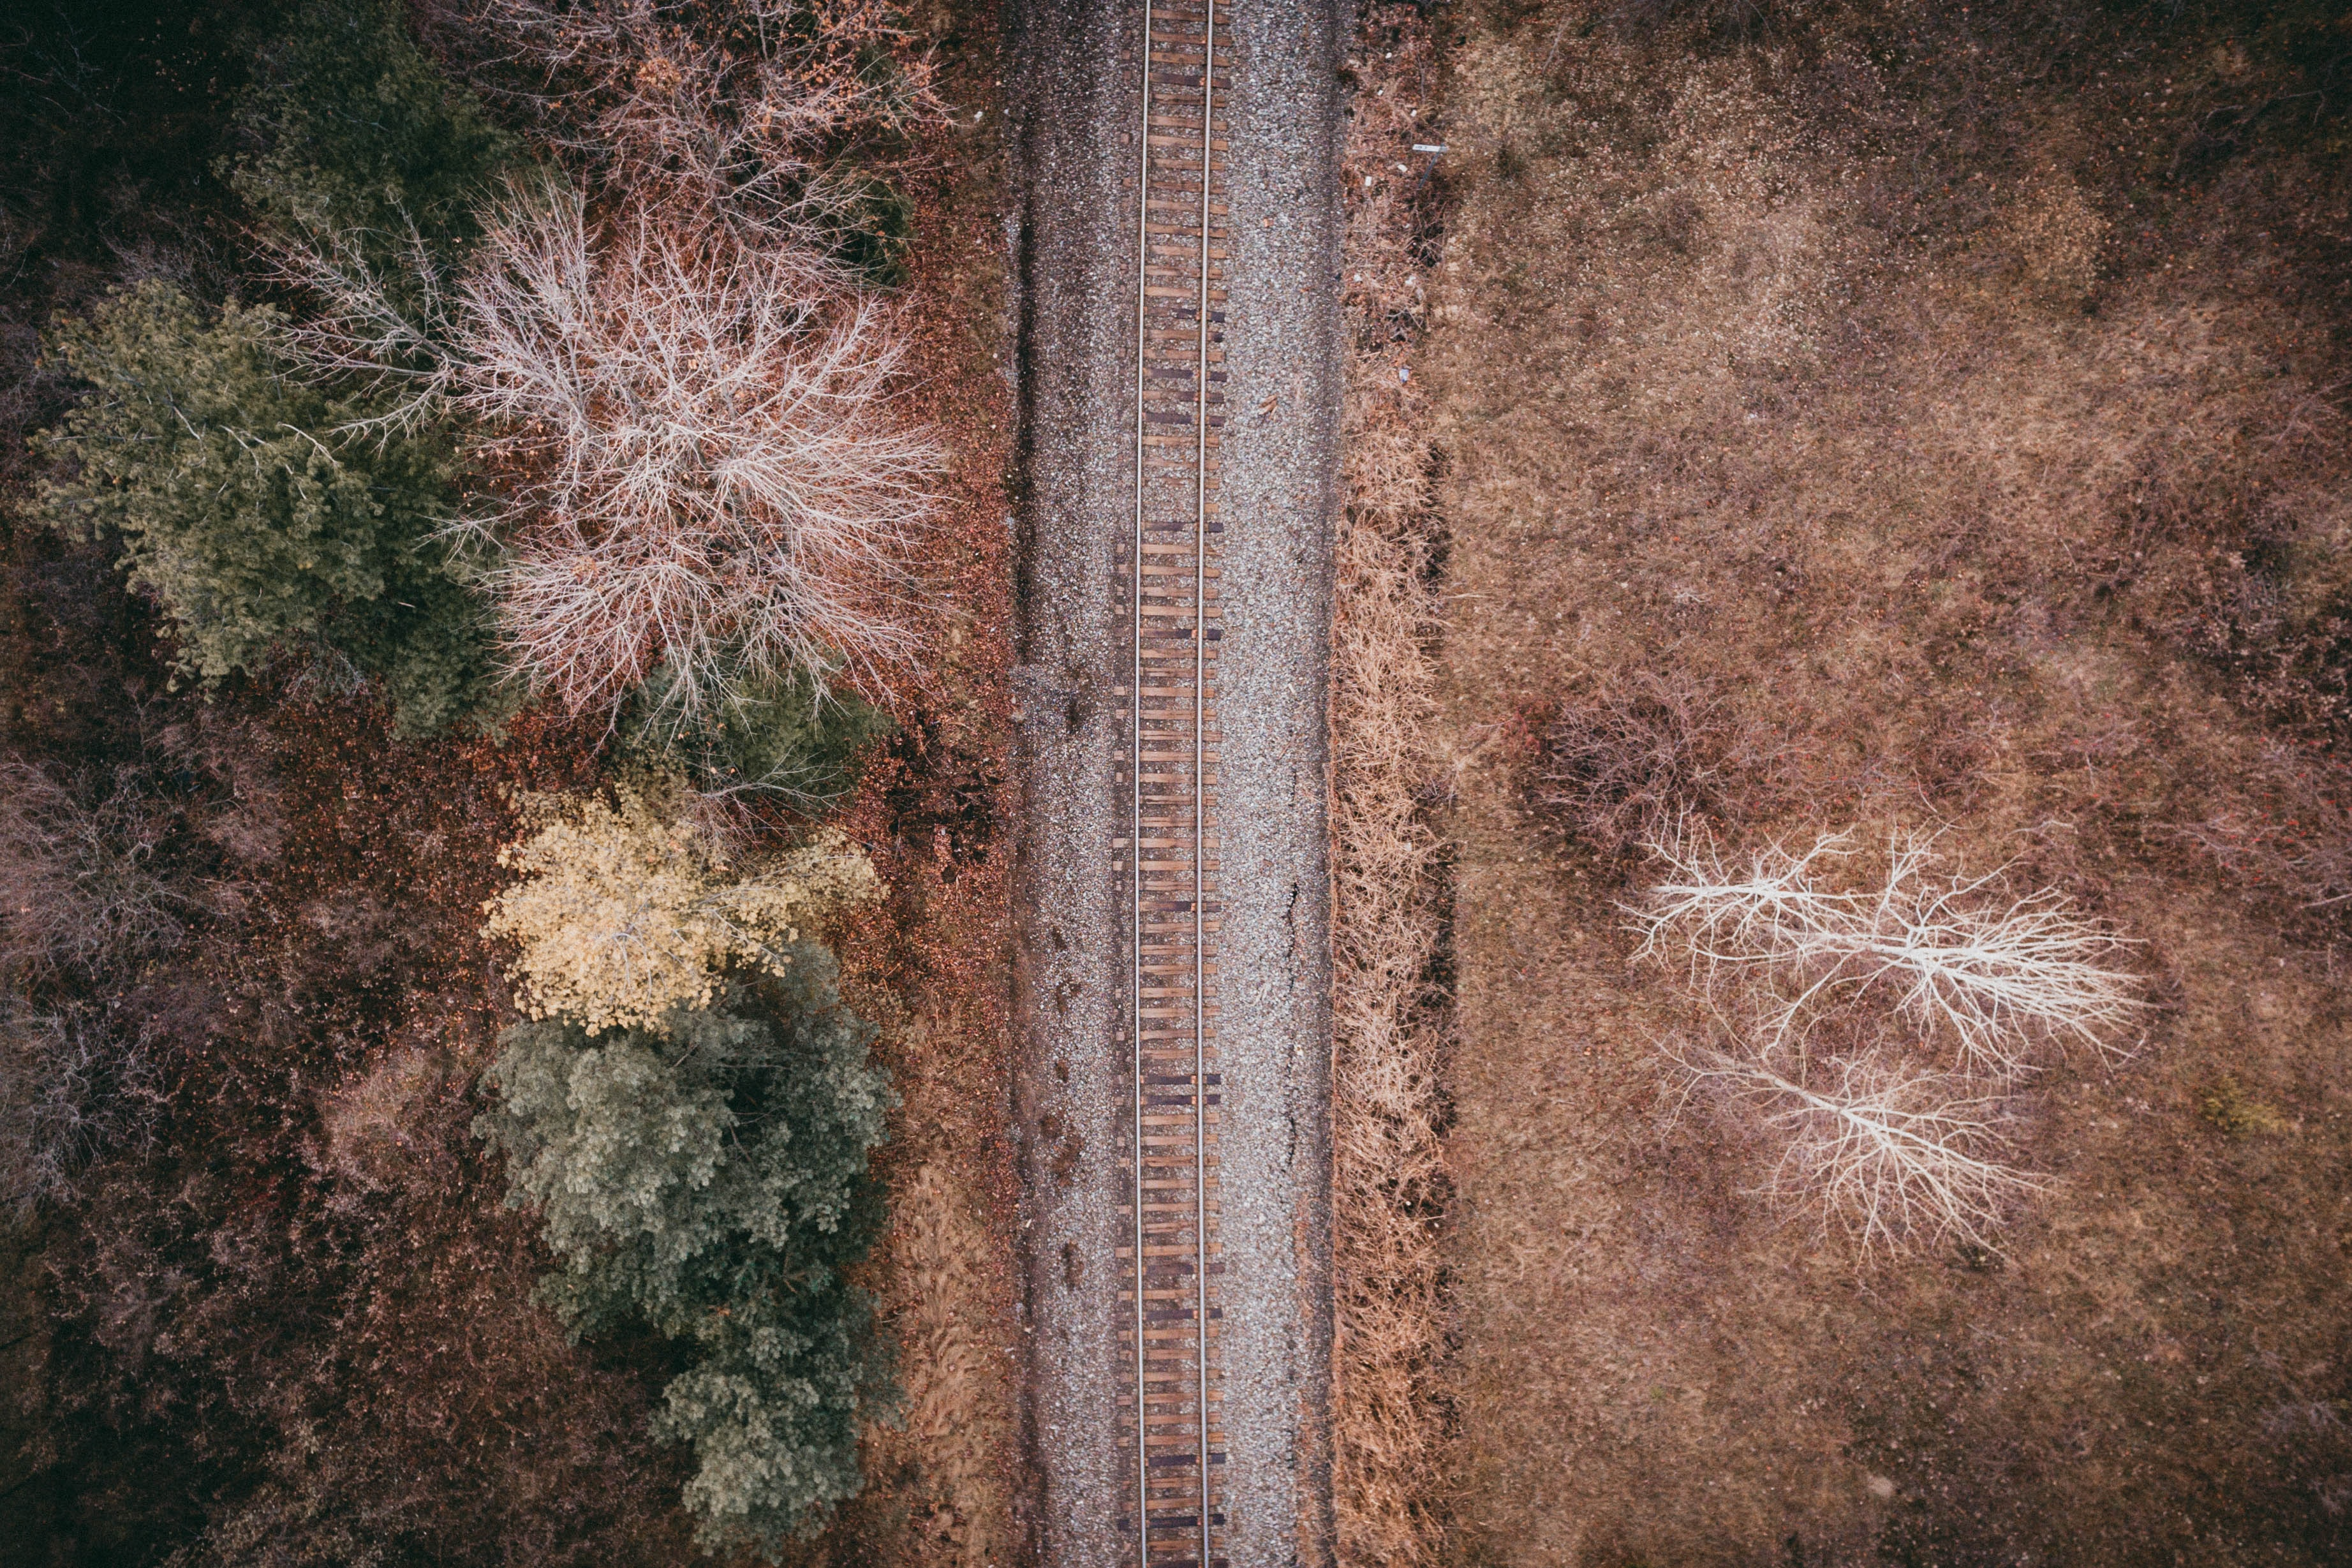 train railway beside land with trees